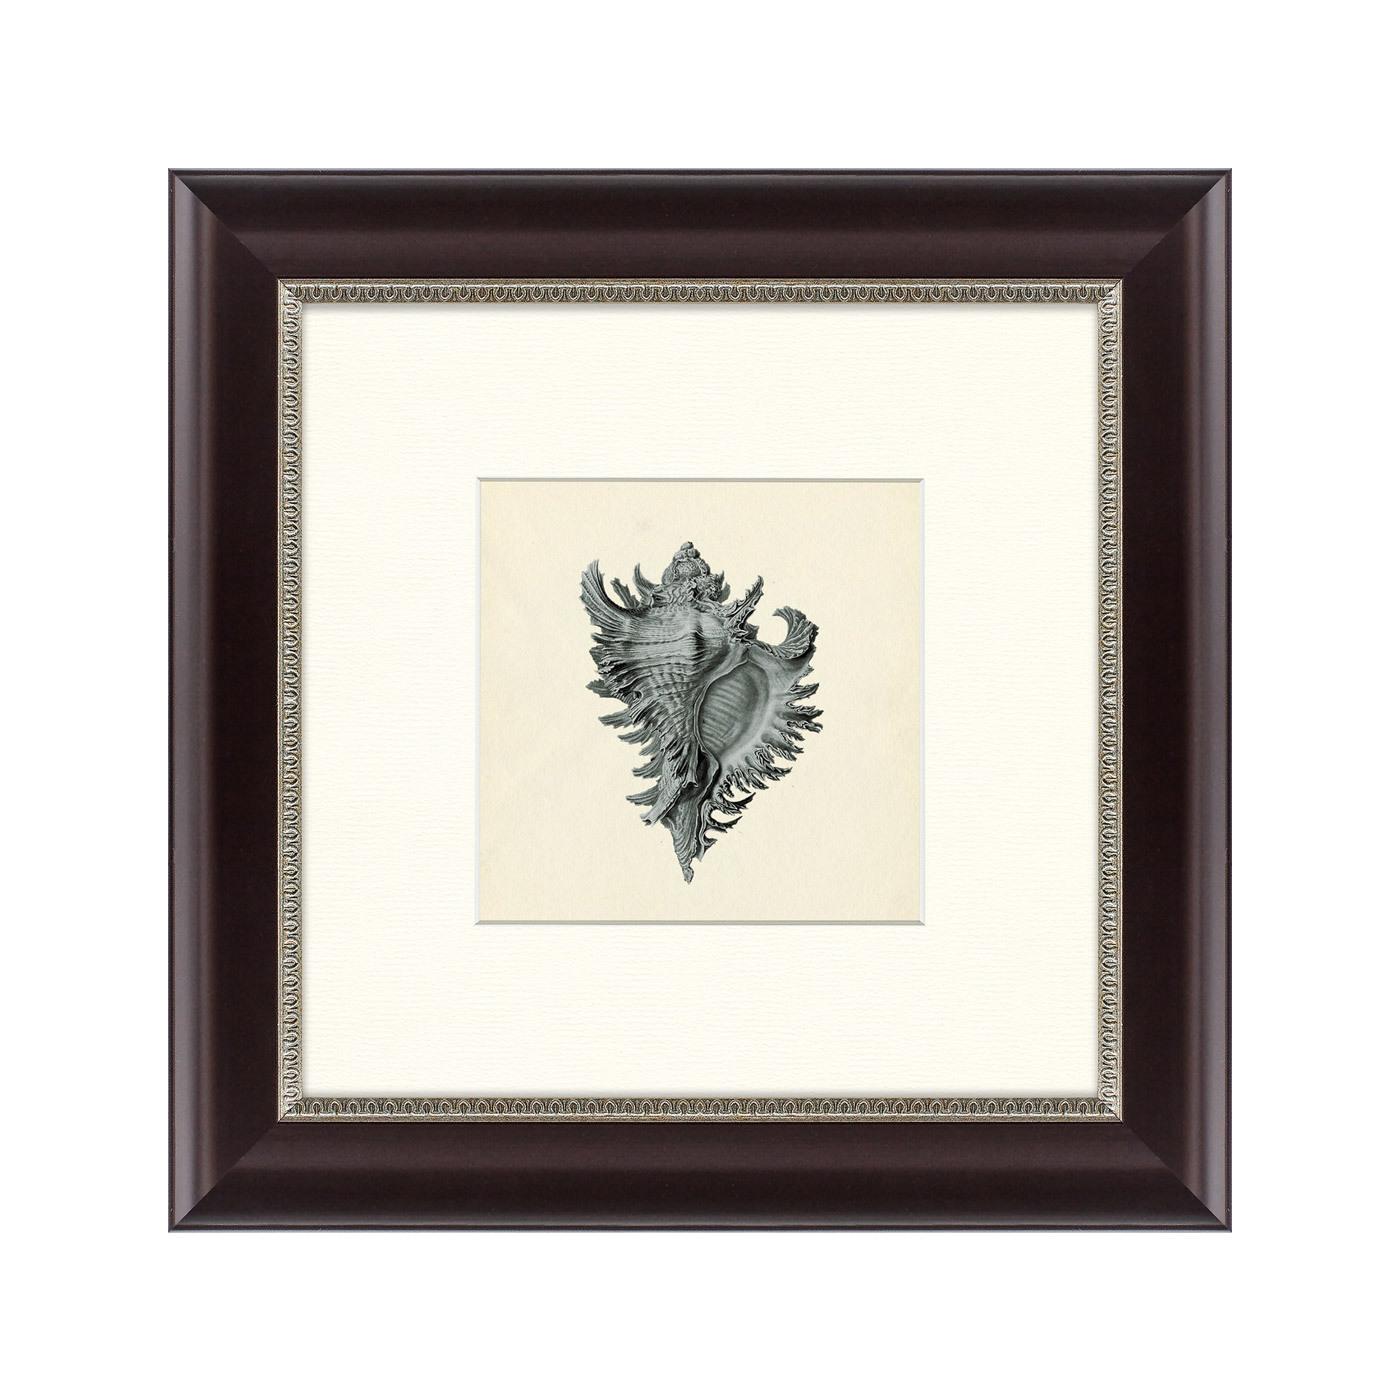 {} Картины в Квартиру Картина Морской Обитатель №1 (35х35 см) картины в квартиру картина каллы 2 35х35 см